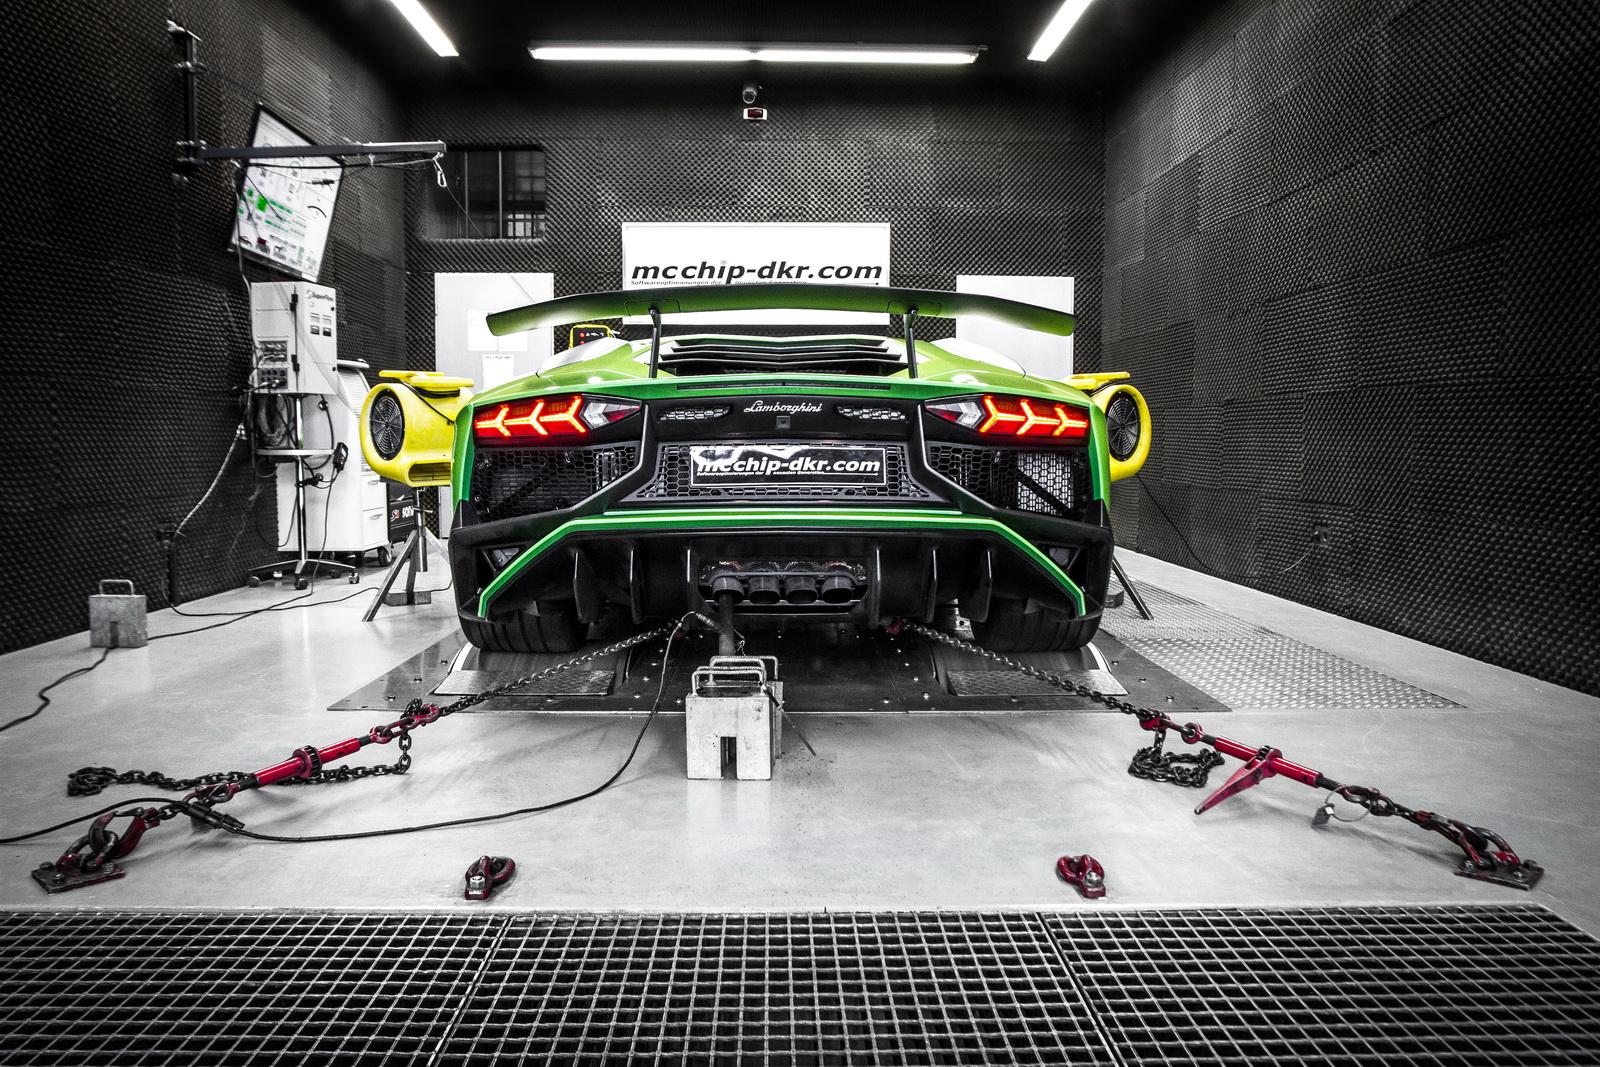 Lamborghini_Aventador_SV_by_Mcchip-DKR_21